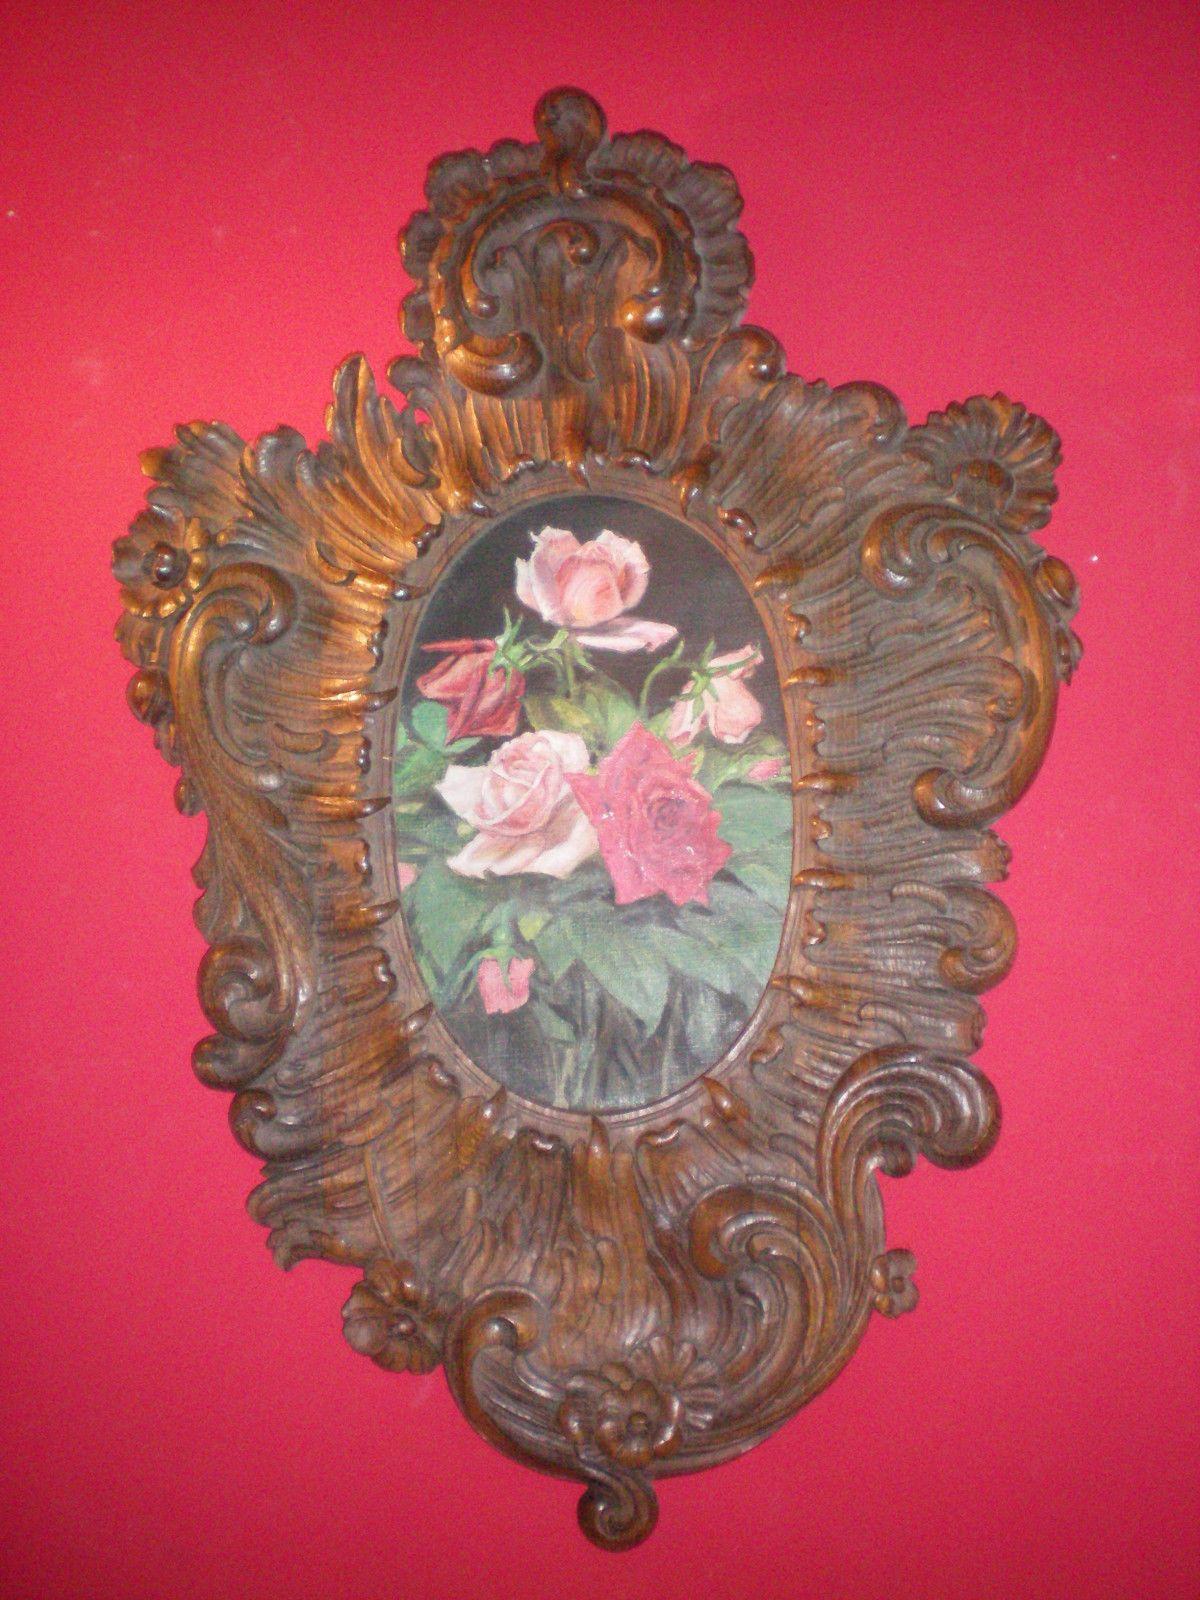 Prunkrahmen Rosen Öl auf Papier 65 x 43 cm Eiche Rahmen Rokoko Bild ...